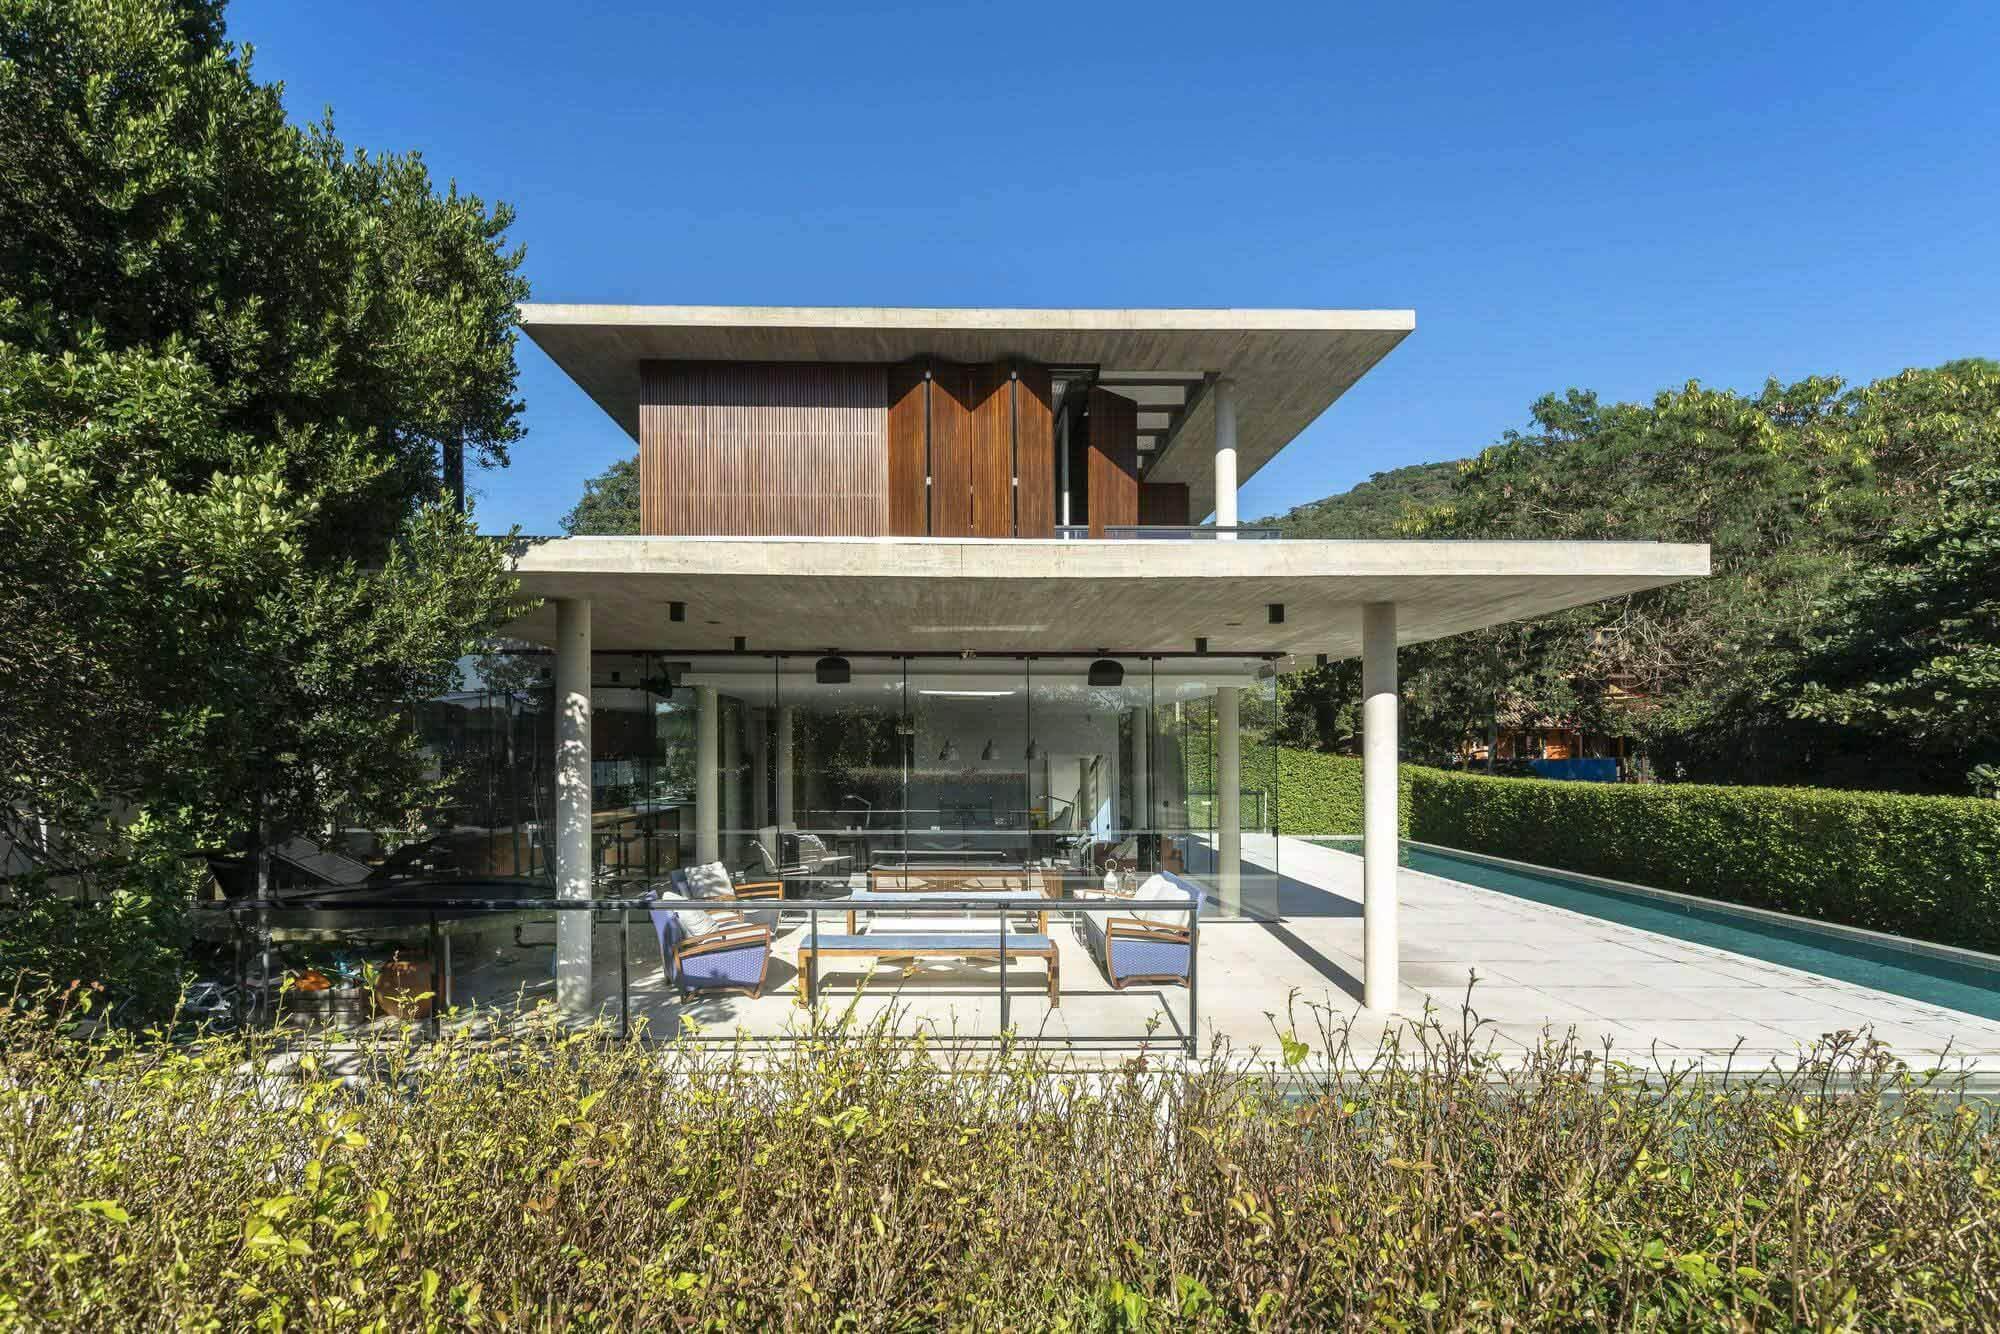 Porto da Lagoa House / Marchetti Bonetti + Arquitetos Associados